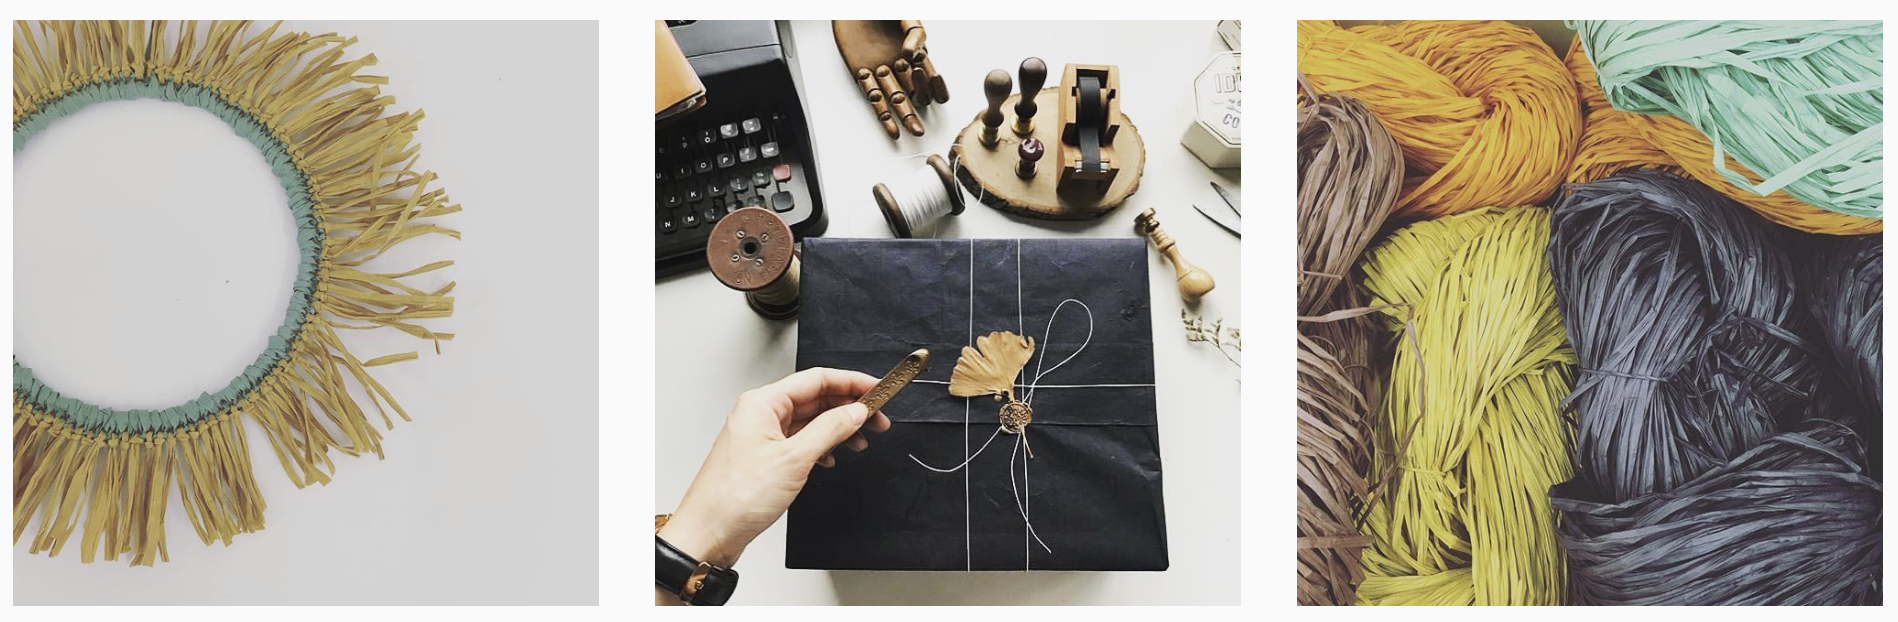 PaperPhine Instagram 2019 01